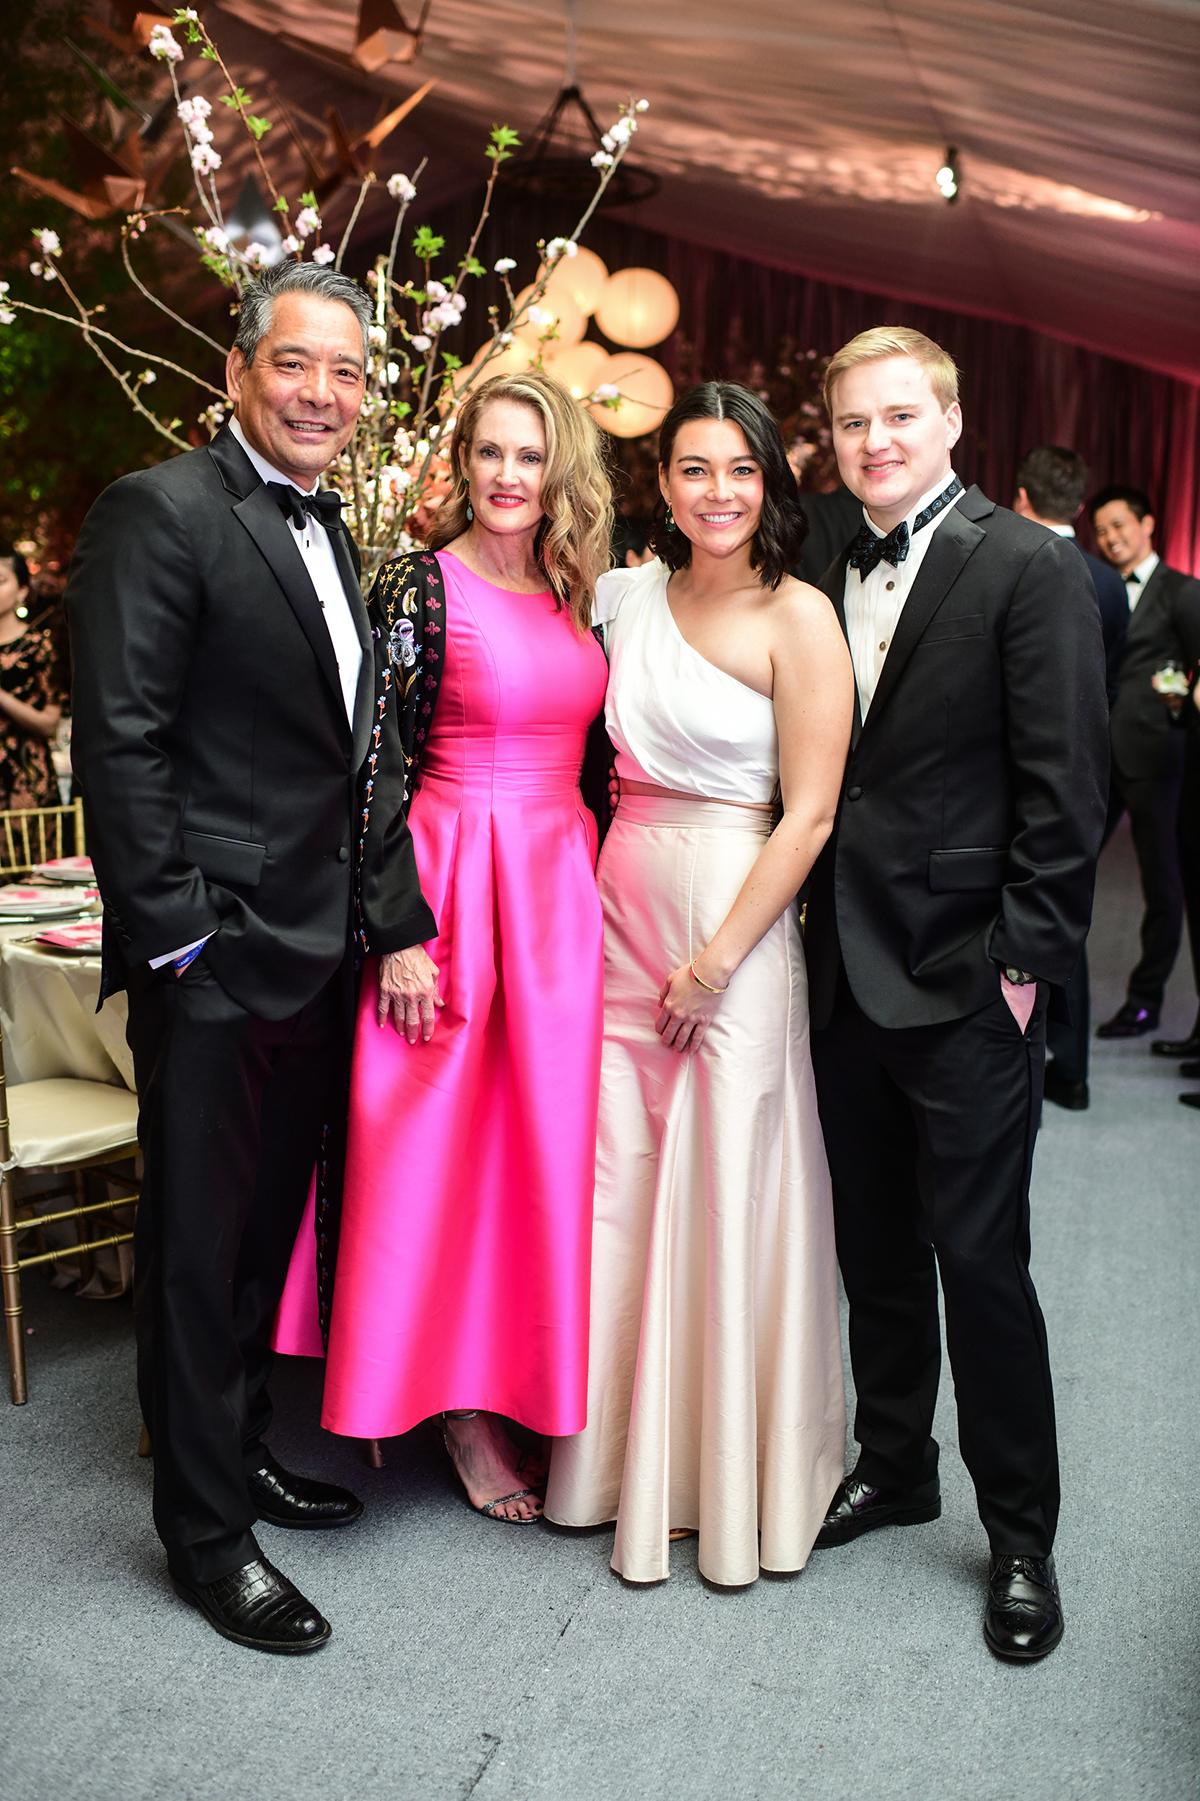 Frank and Stephanie Tsuru & Bailey Tsuru and Tanner Saha